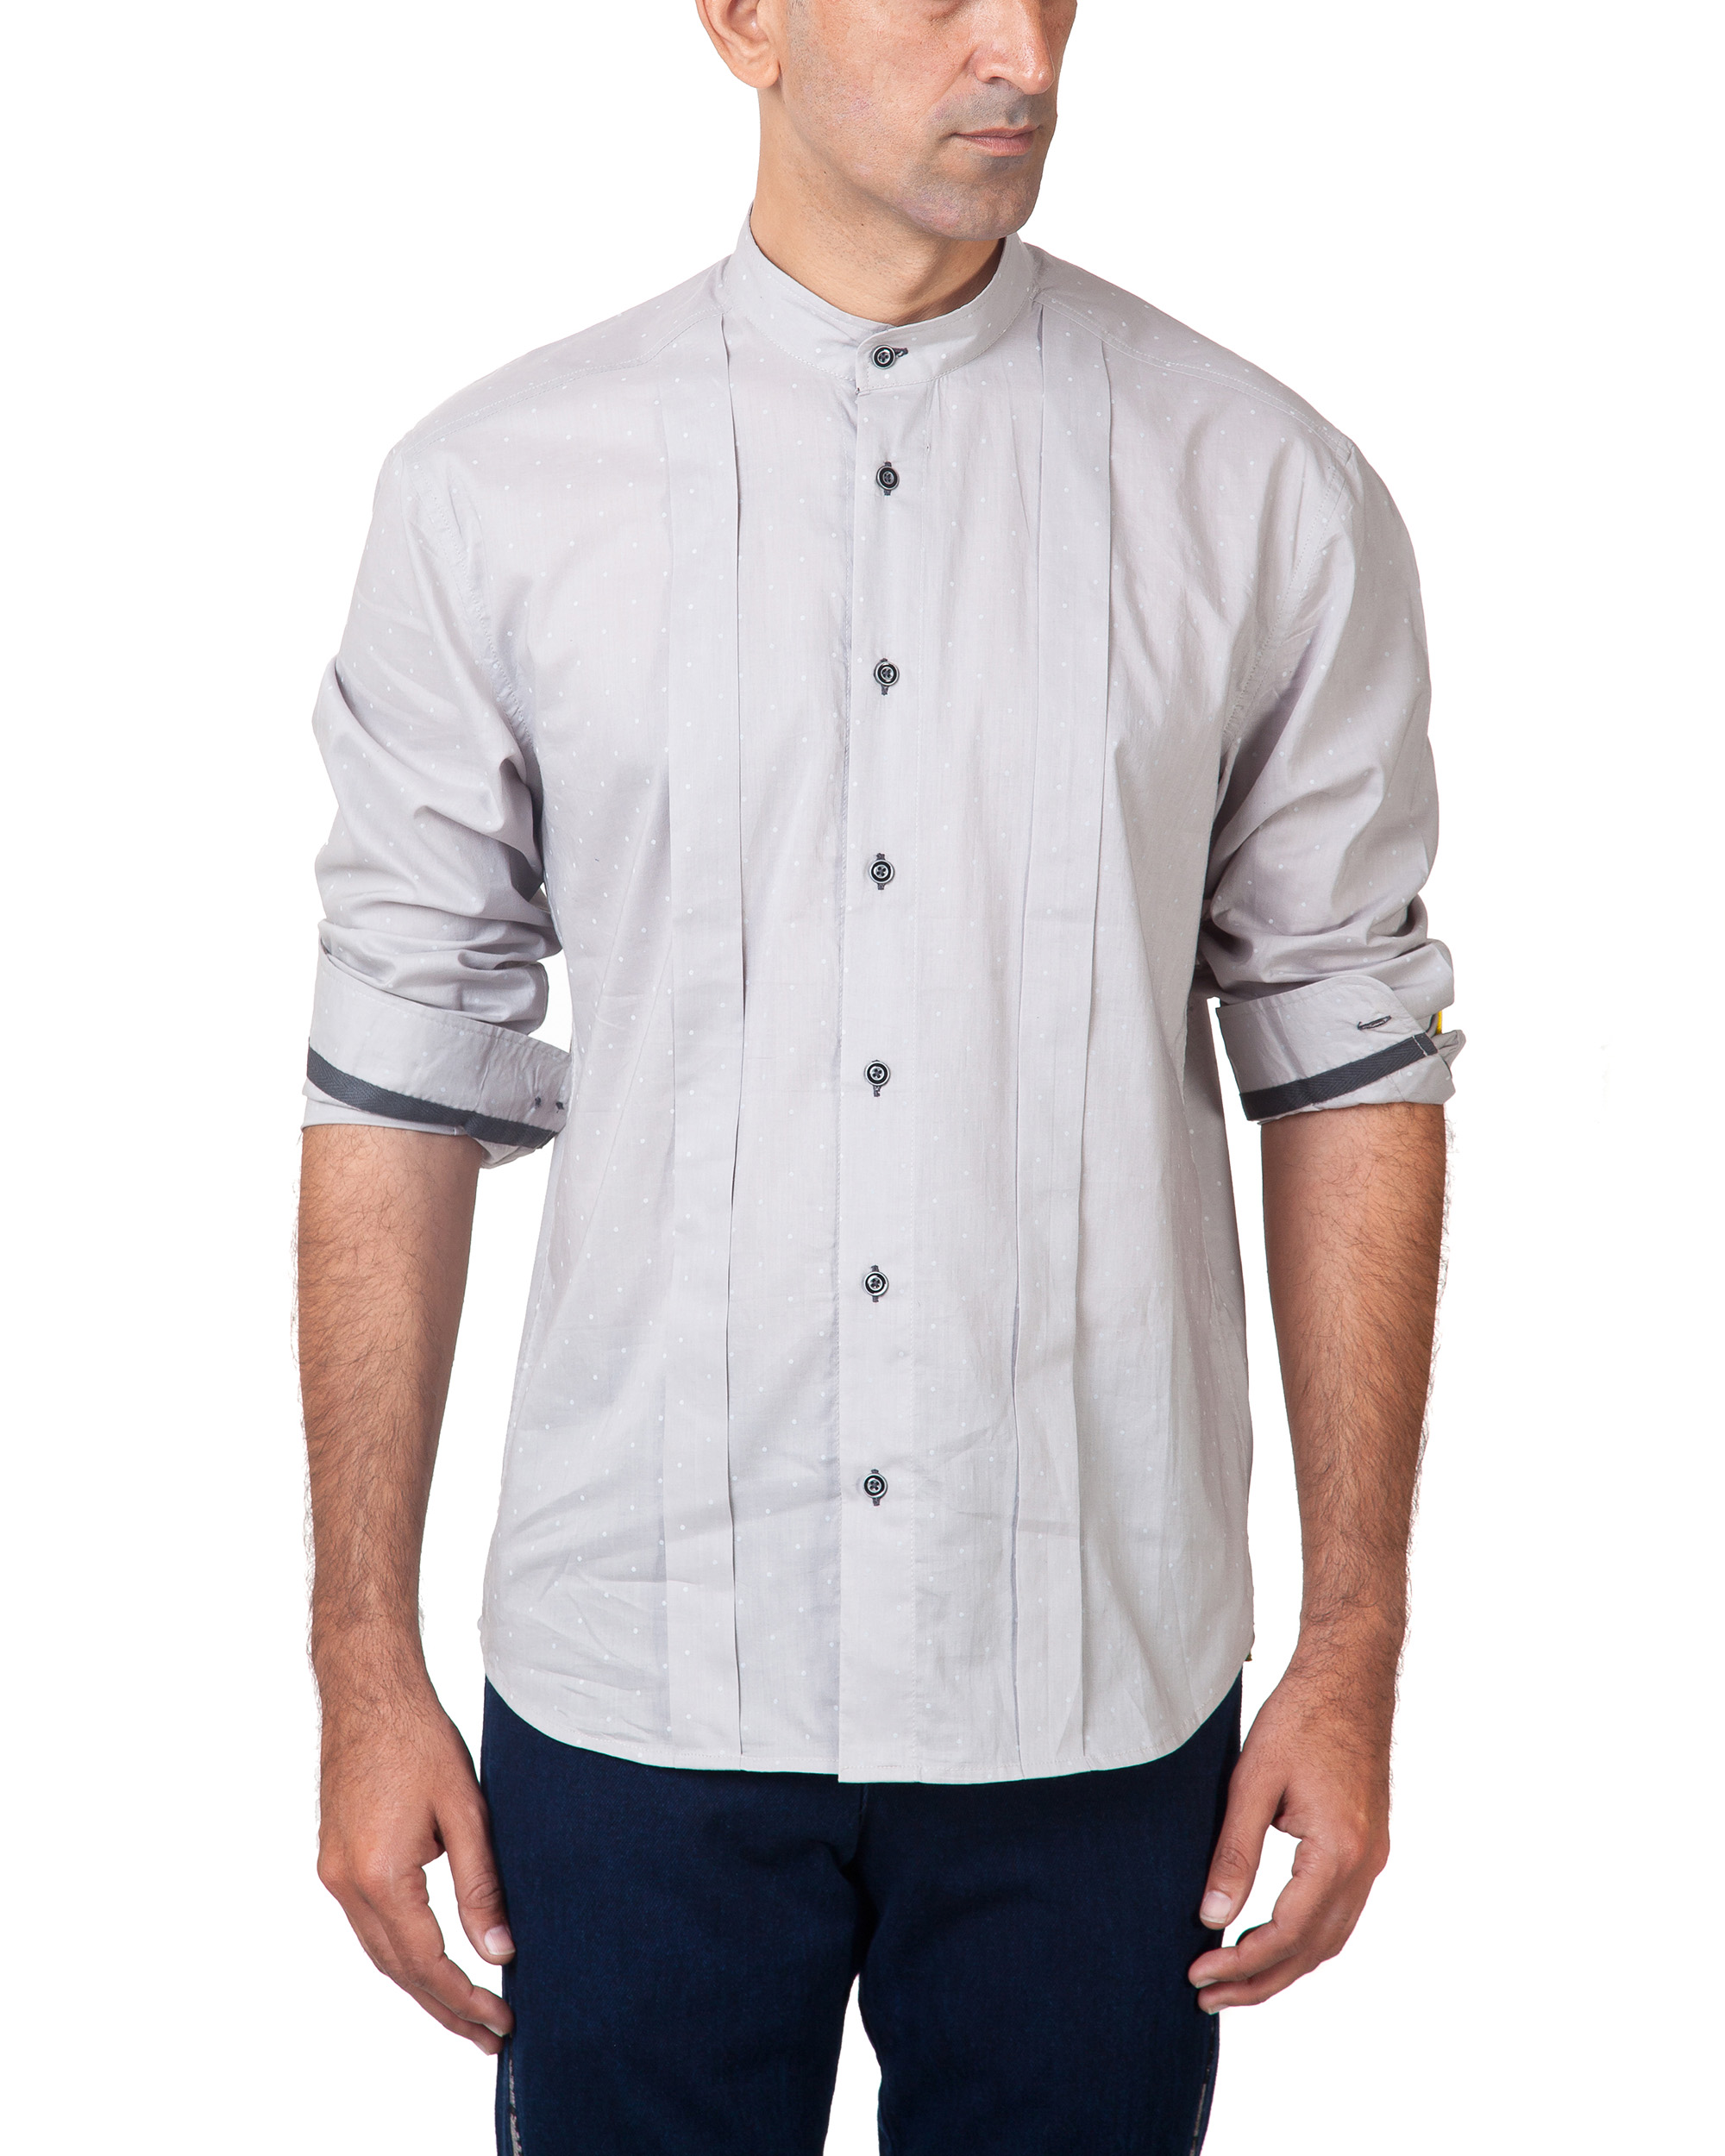 Grey polka shirt